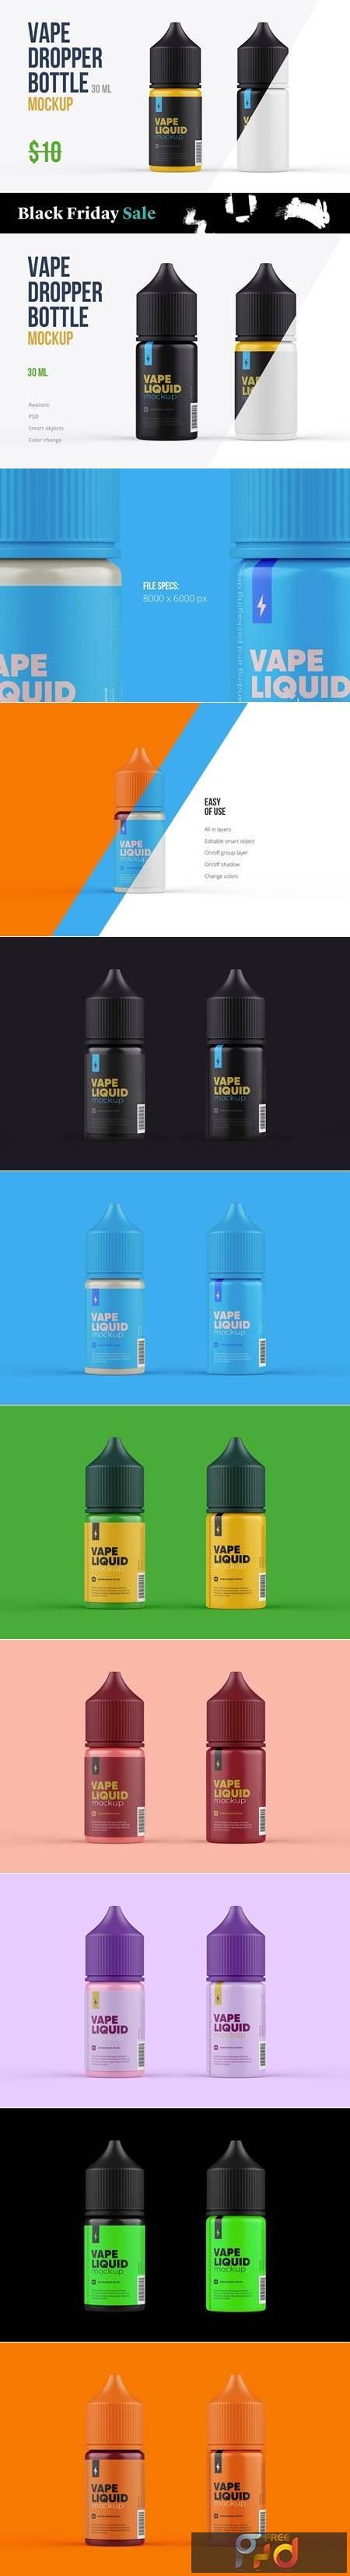 Vape Dropper Bottle Mockup 30ml 5639405 1